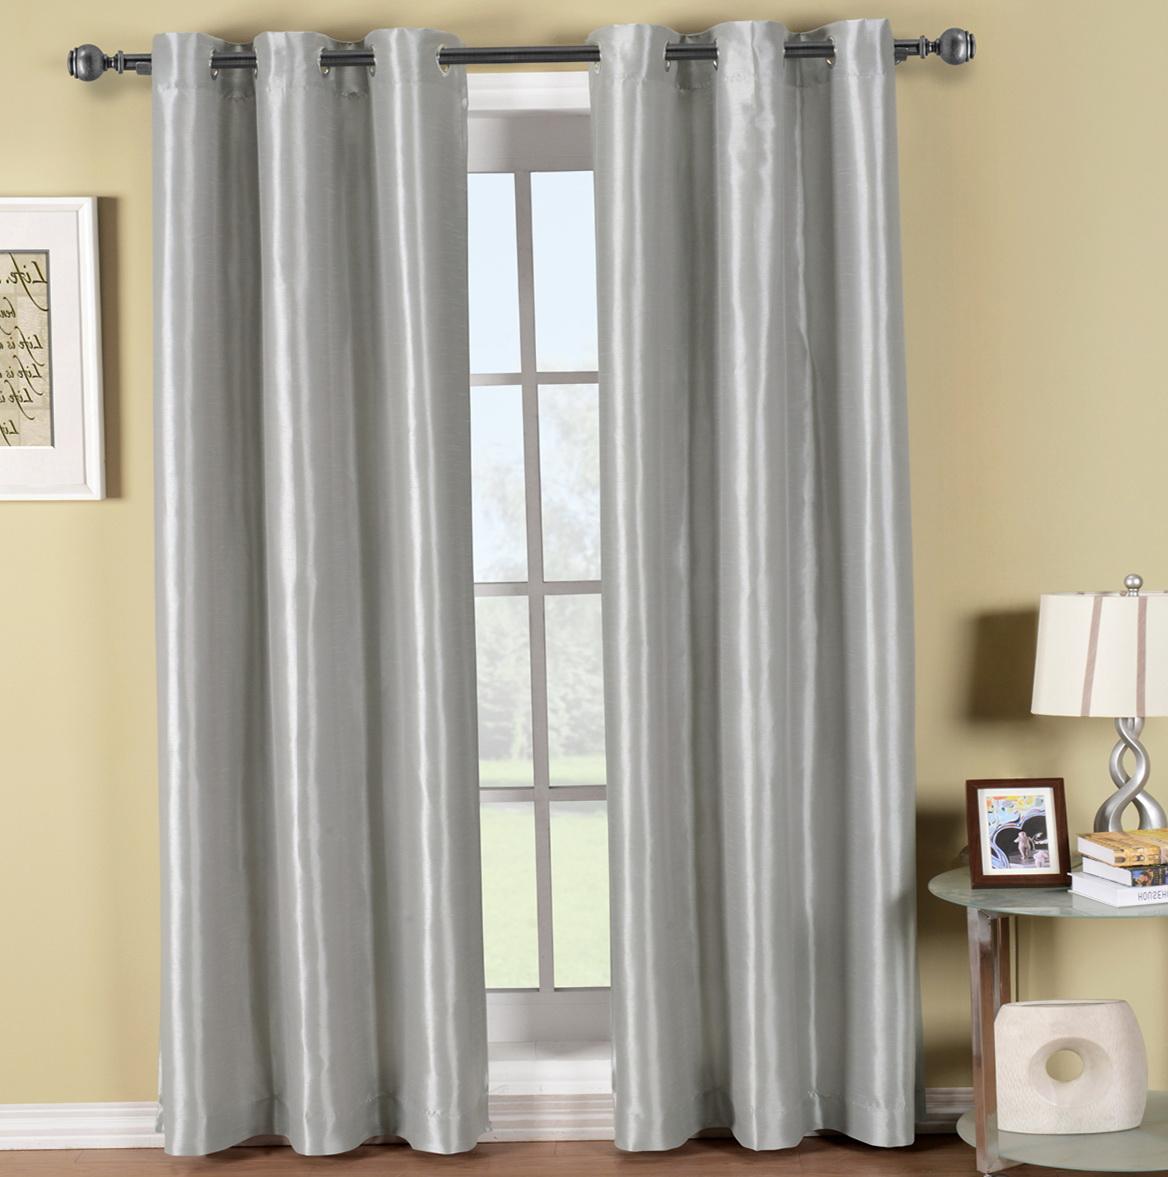 Extra long sheer curtains